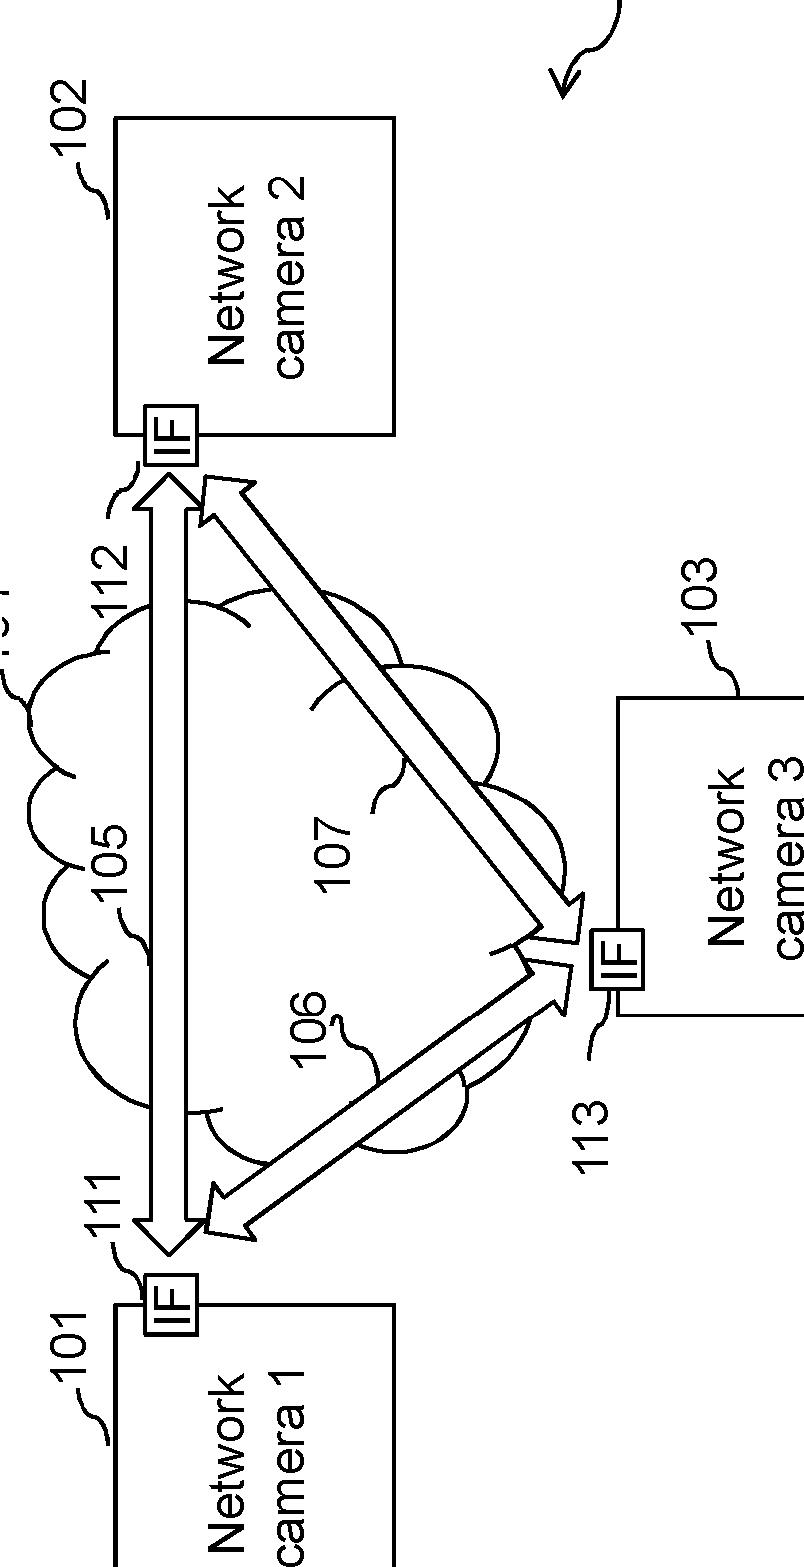 Figure GB2553108A_D0002